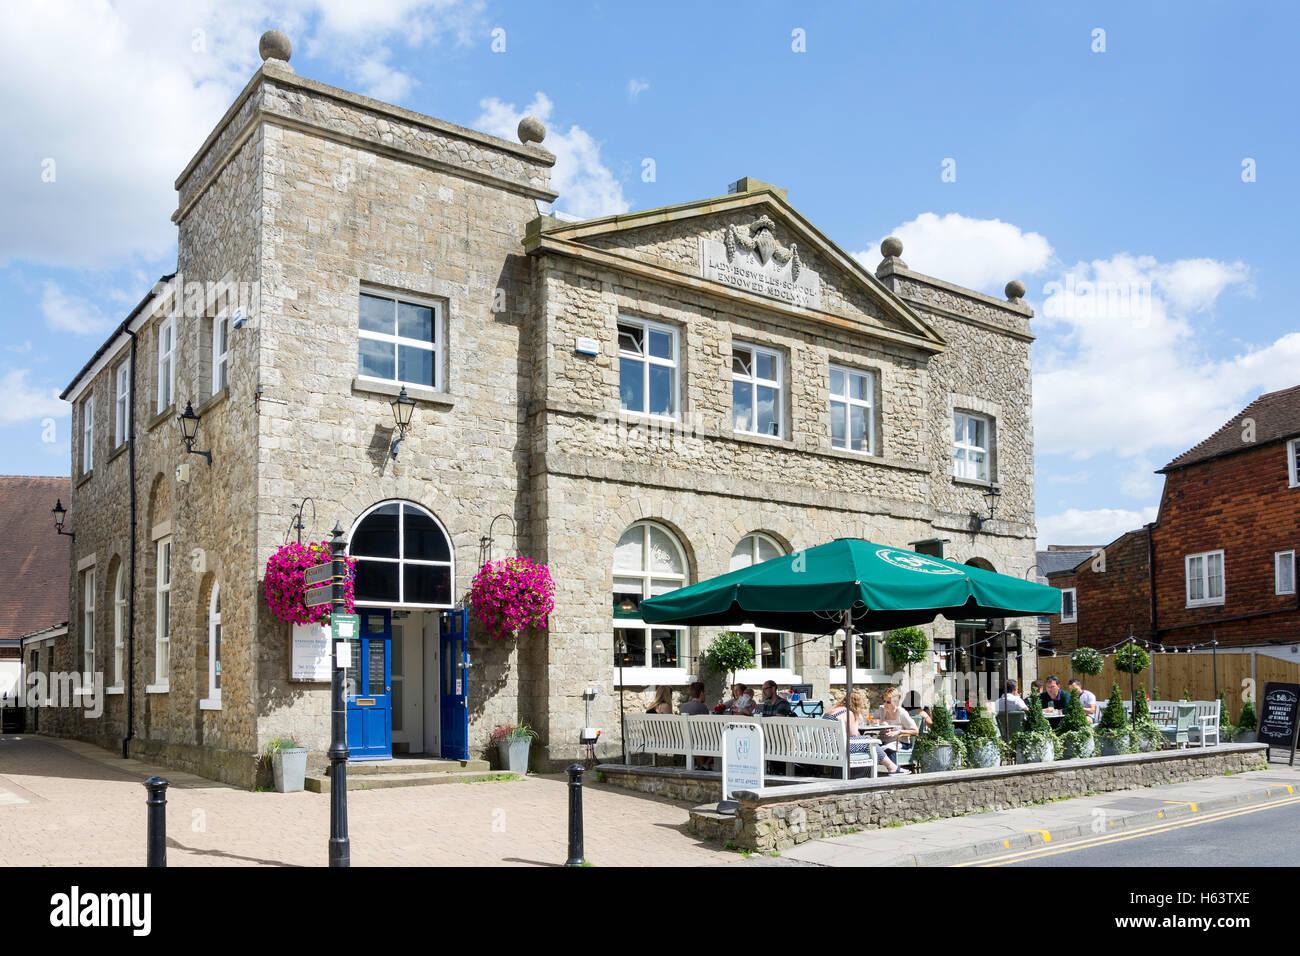 Outdoor terrace at Bill's Restaurant, Lady Boswell House, London Road, Sevenoaks, Kent, England, United Kingdom - Stock Image